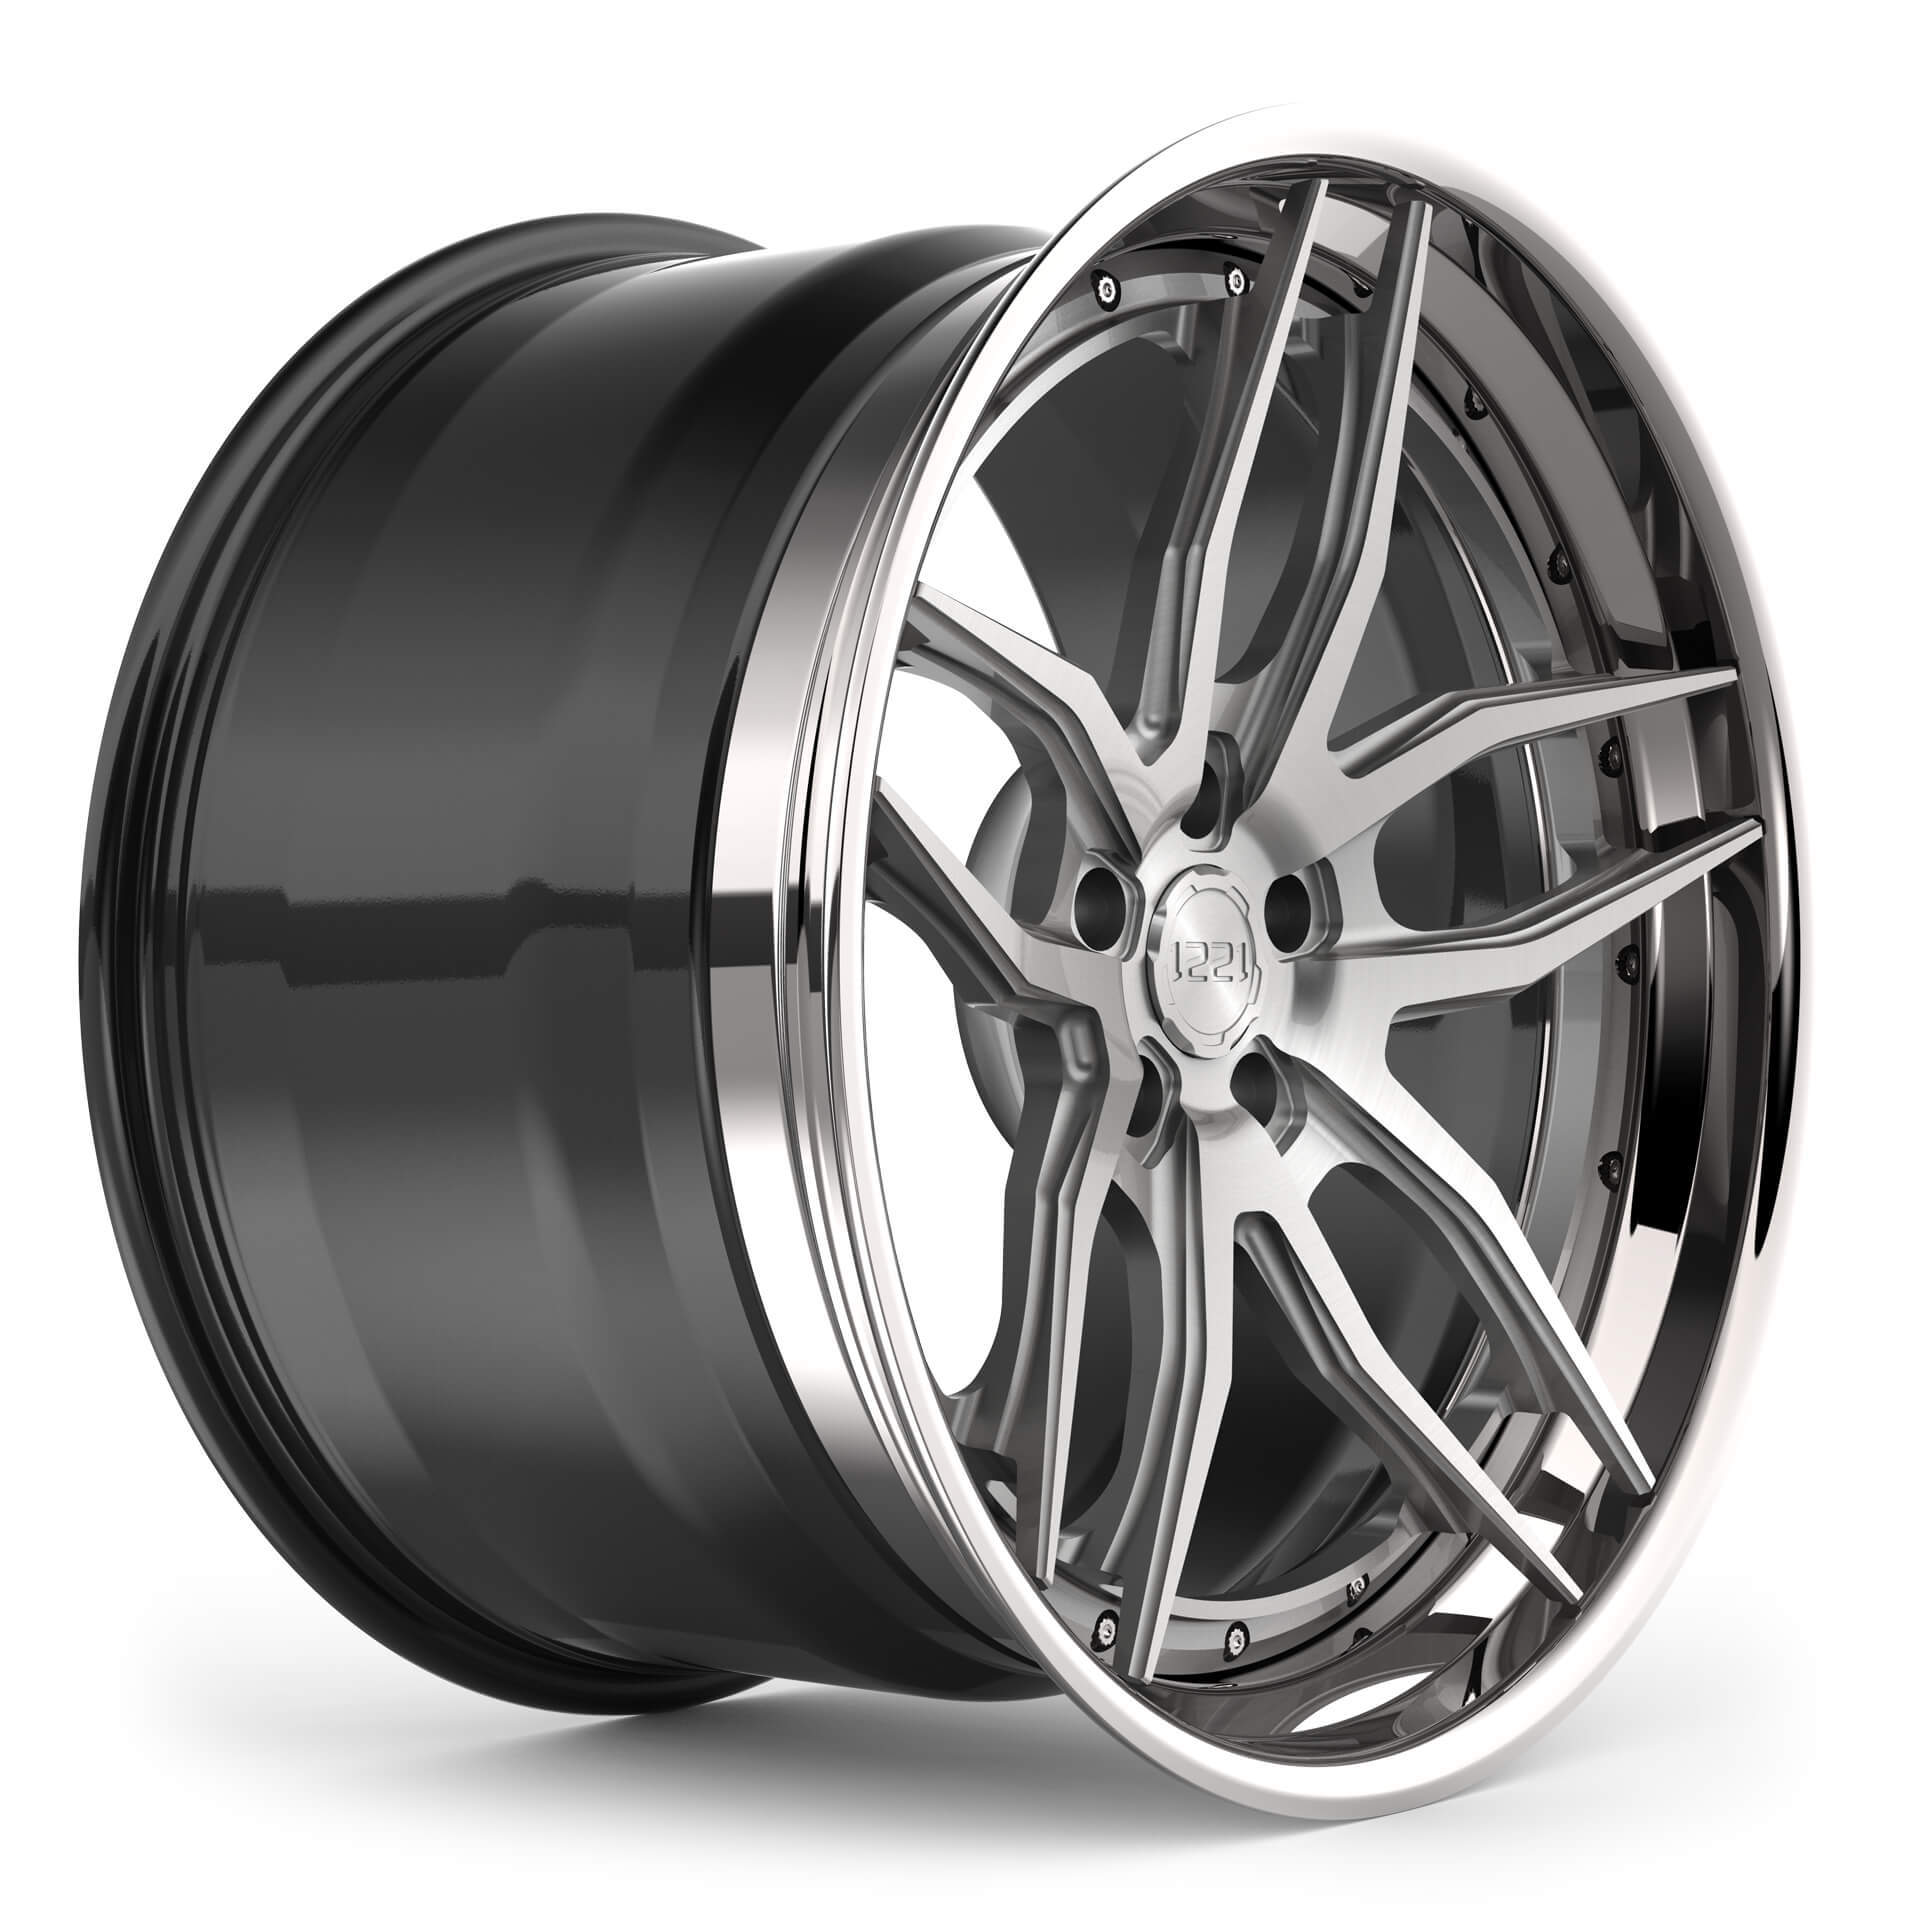 1221 Wheels 0770 AP3L SPORT3.0 forged wheels